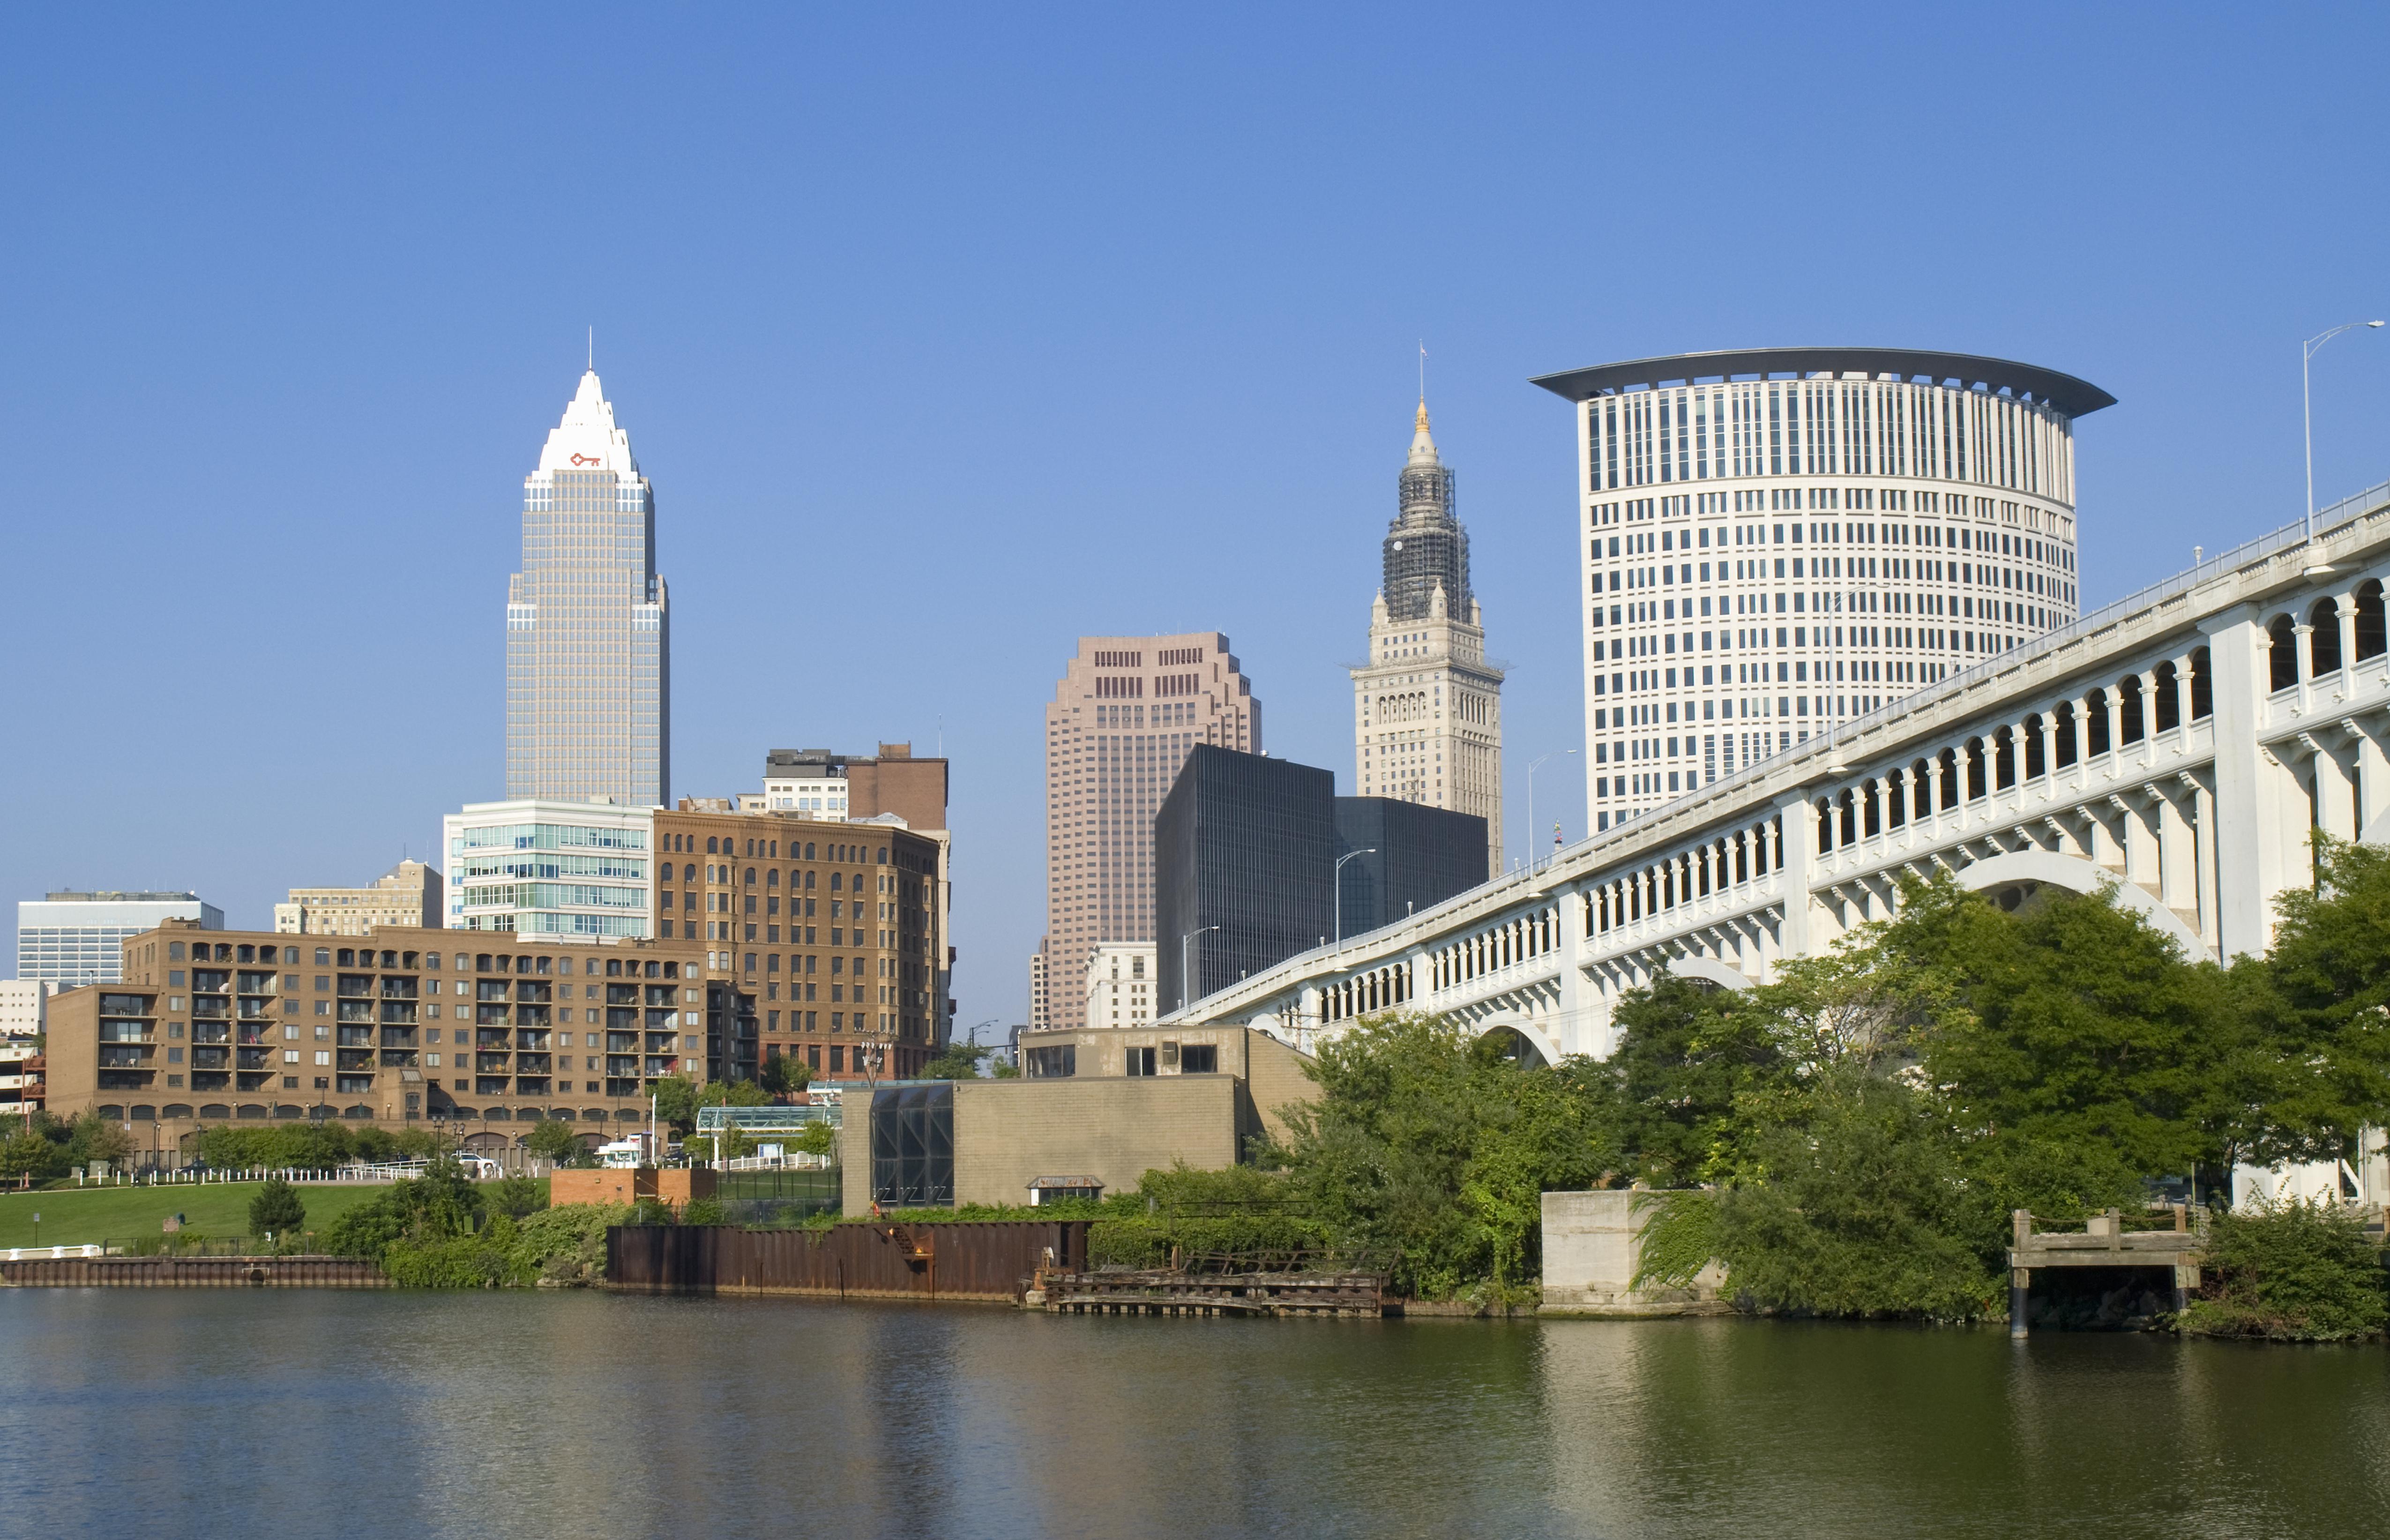 USA, Ohio, Cleveland, downtown skyline